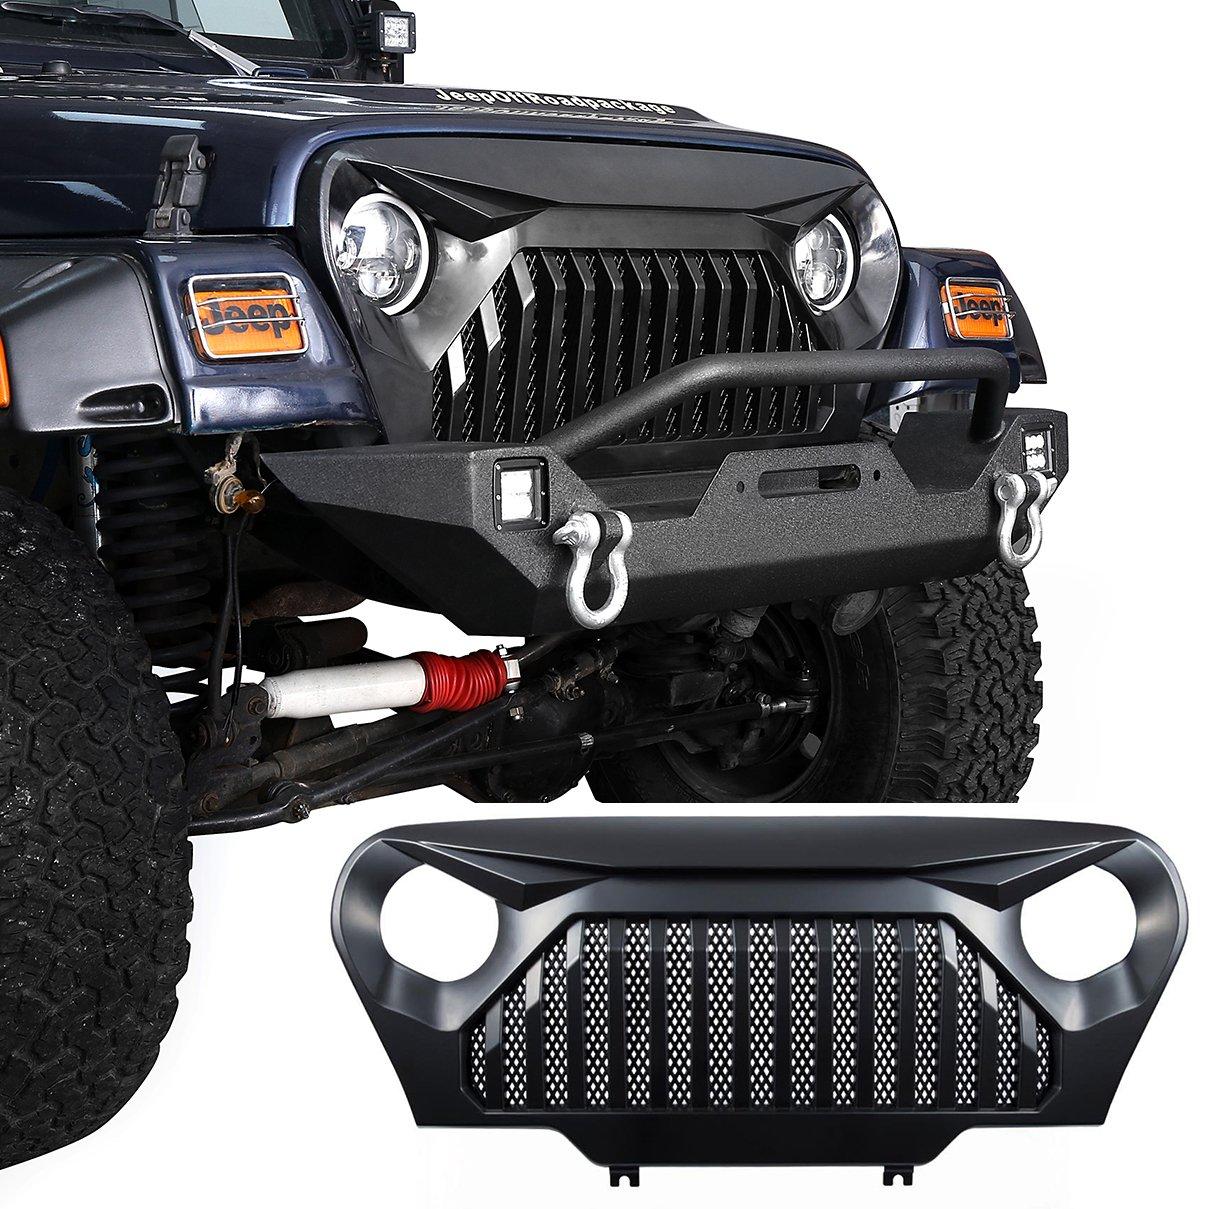 u-Box Different Trail Front Bumper /& Gladiator Grille Guard for 1997-2006 Jeep Wrangler TJ